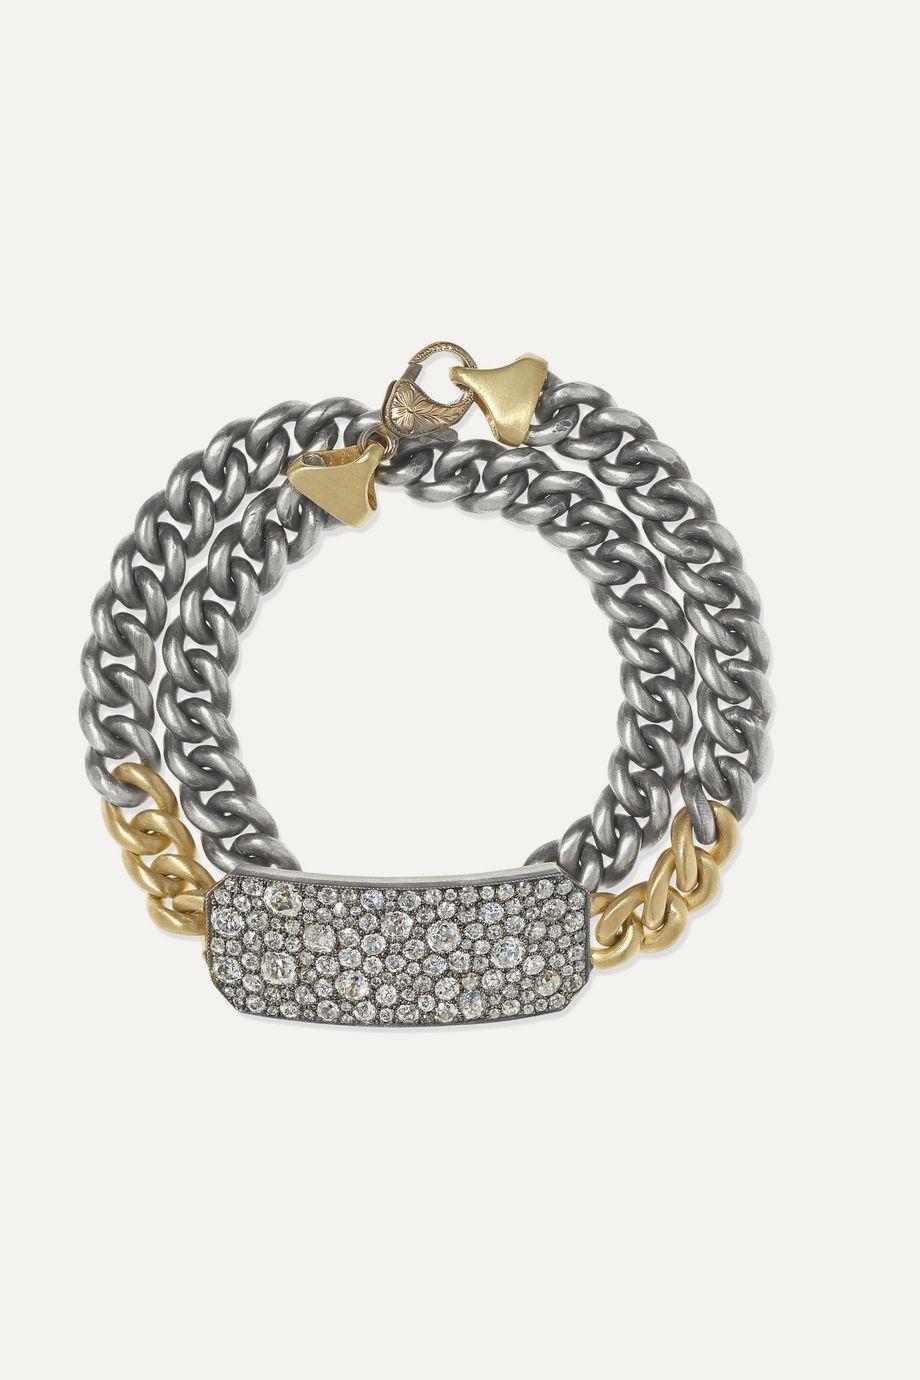 Sylva & Cie 18-karat gold, sterling silver and diamond bracelet